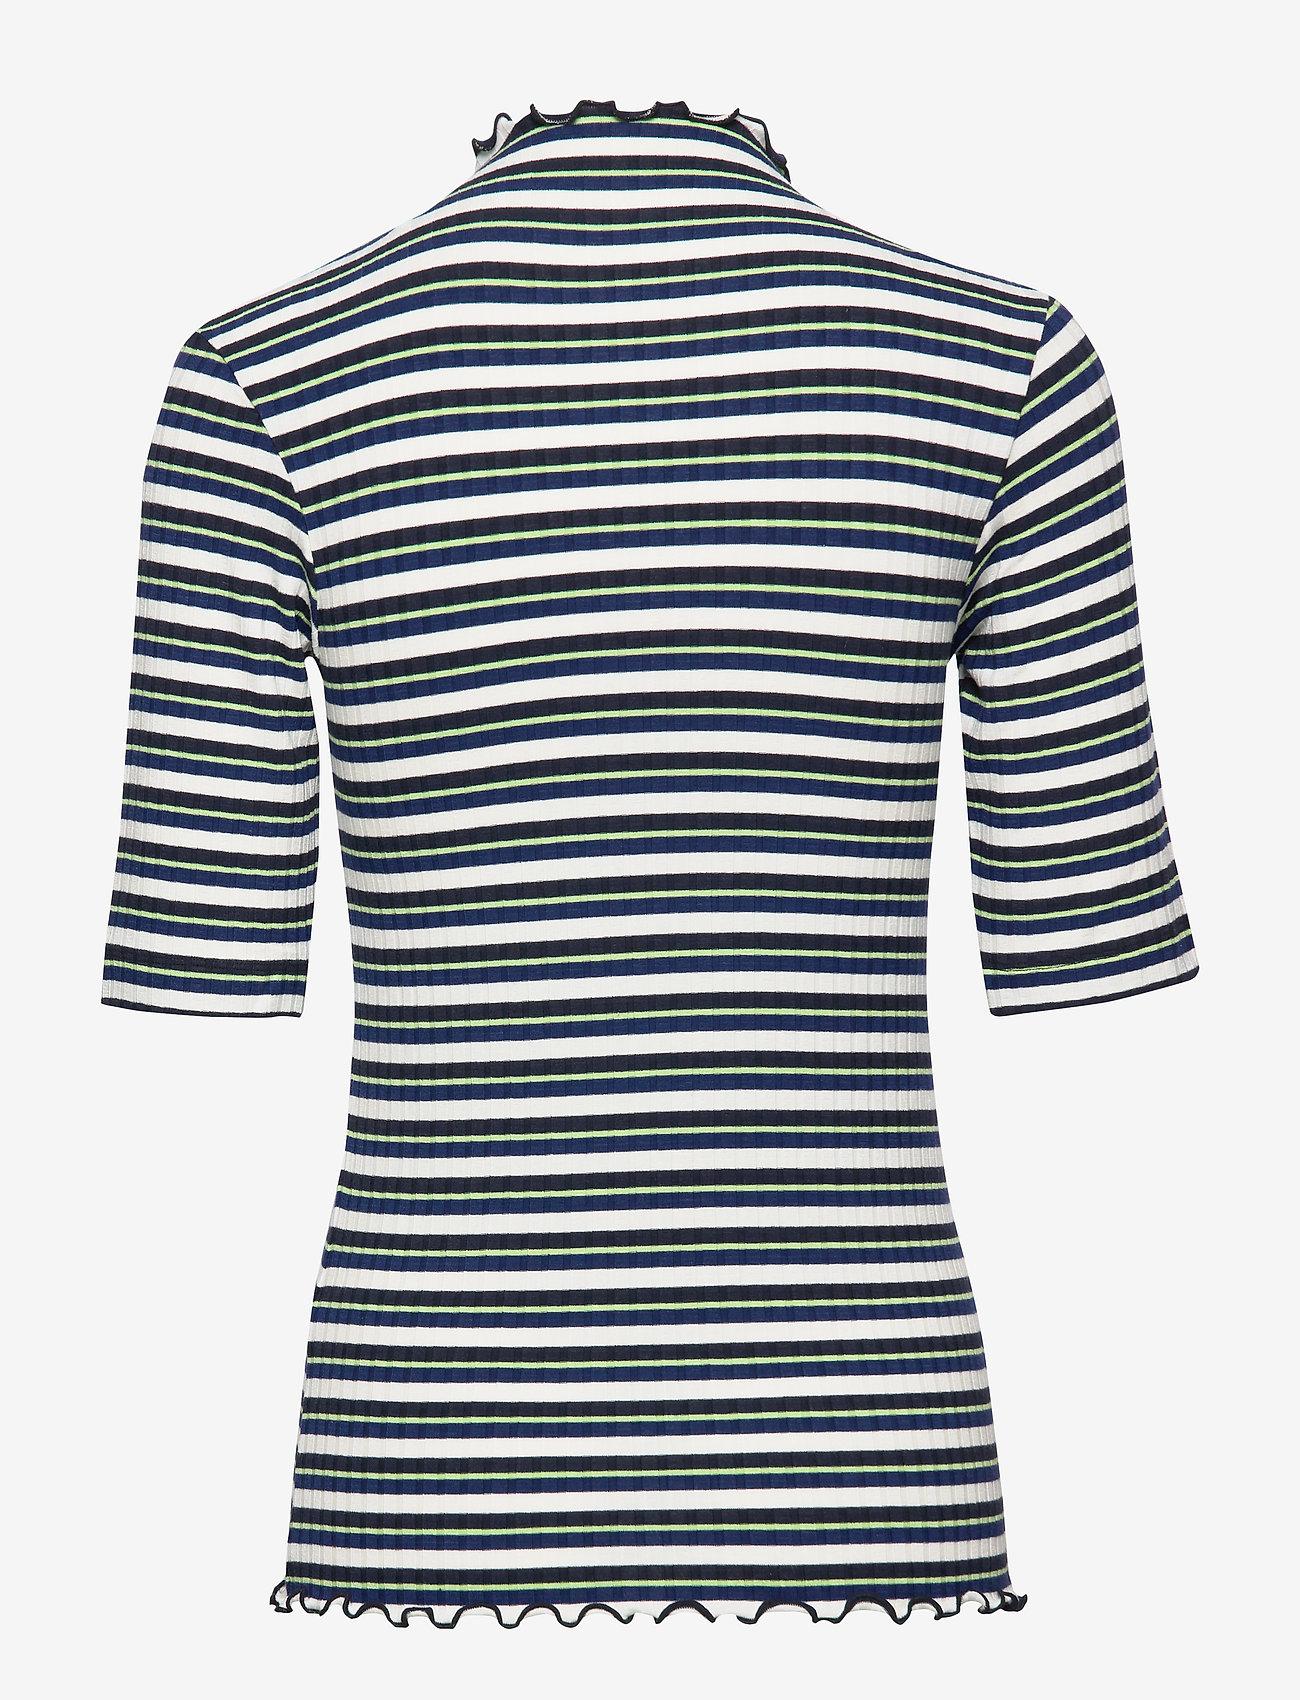 5x5 Dream Stripe Trutte Short (Navy Multi) (525 kr) - Mads Nørgaard